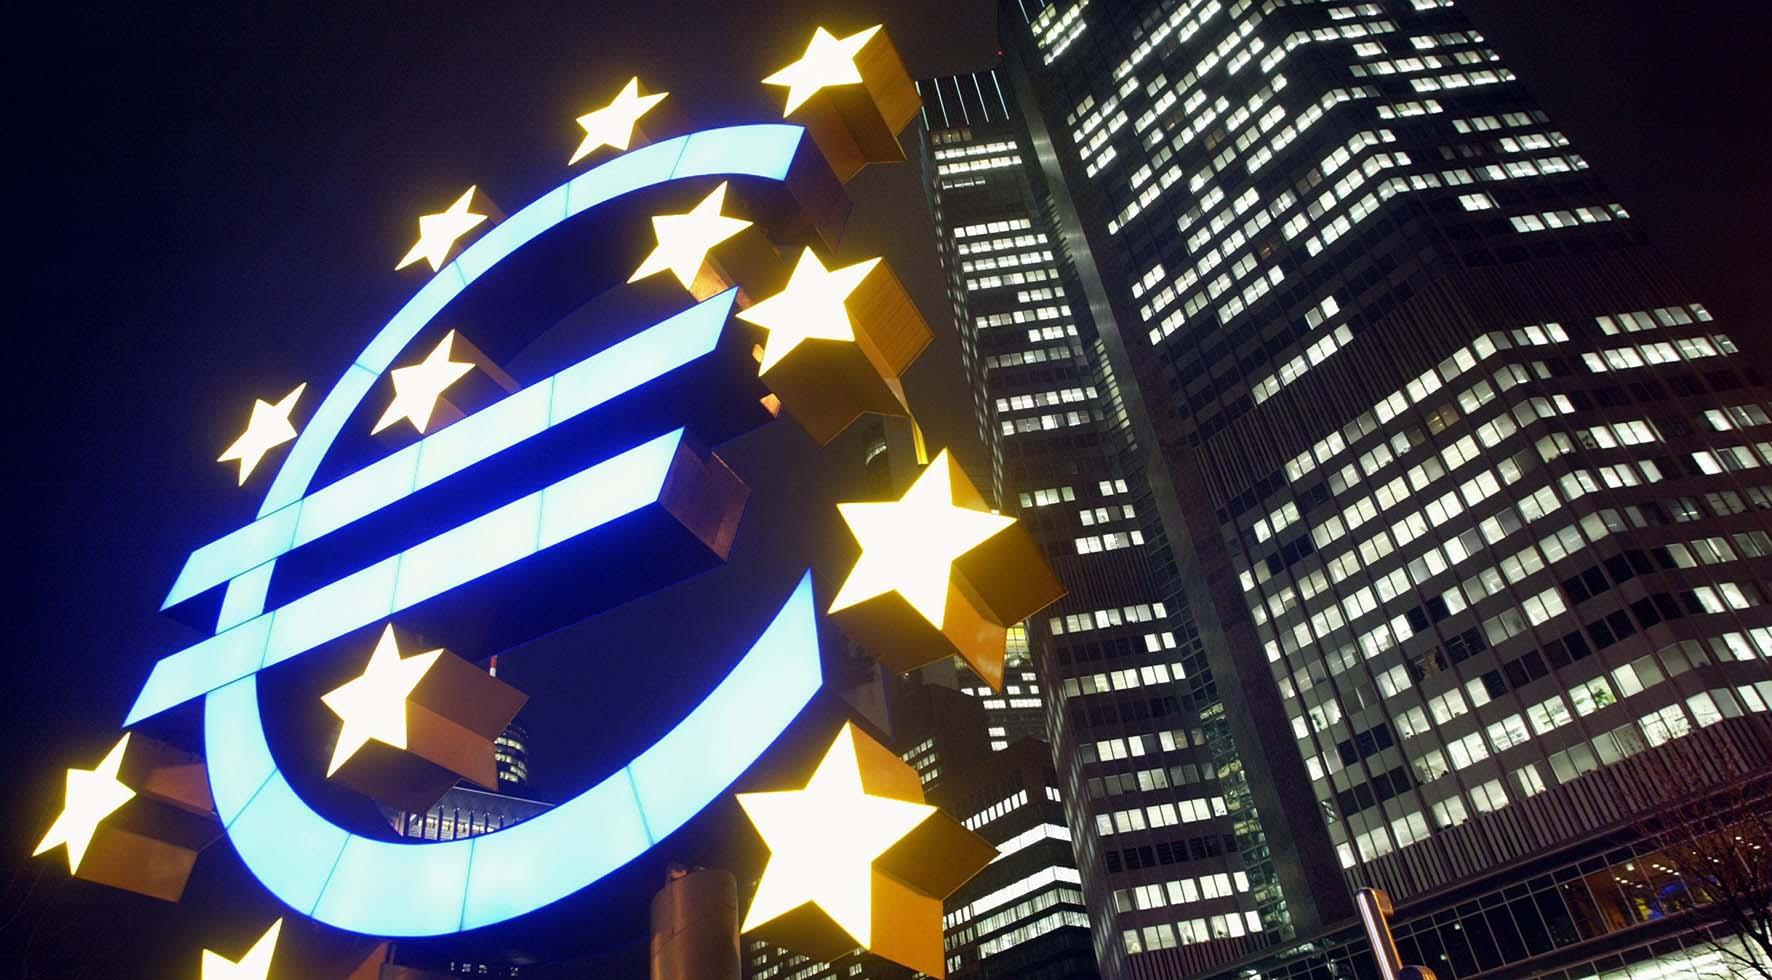 quantitative easing simbolo euro eurotower sede bce